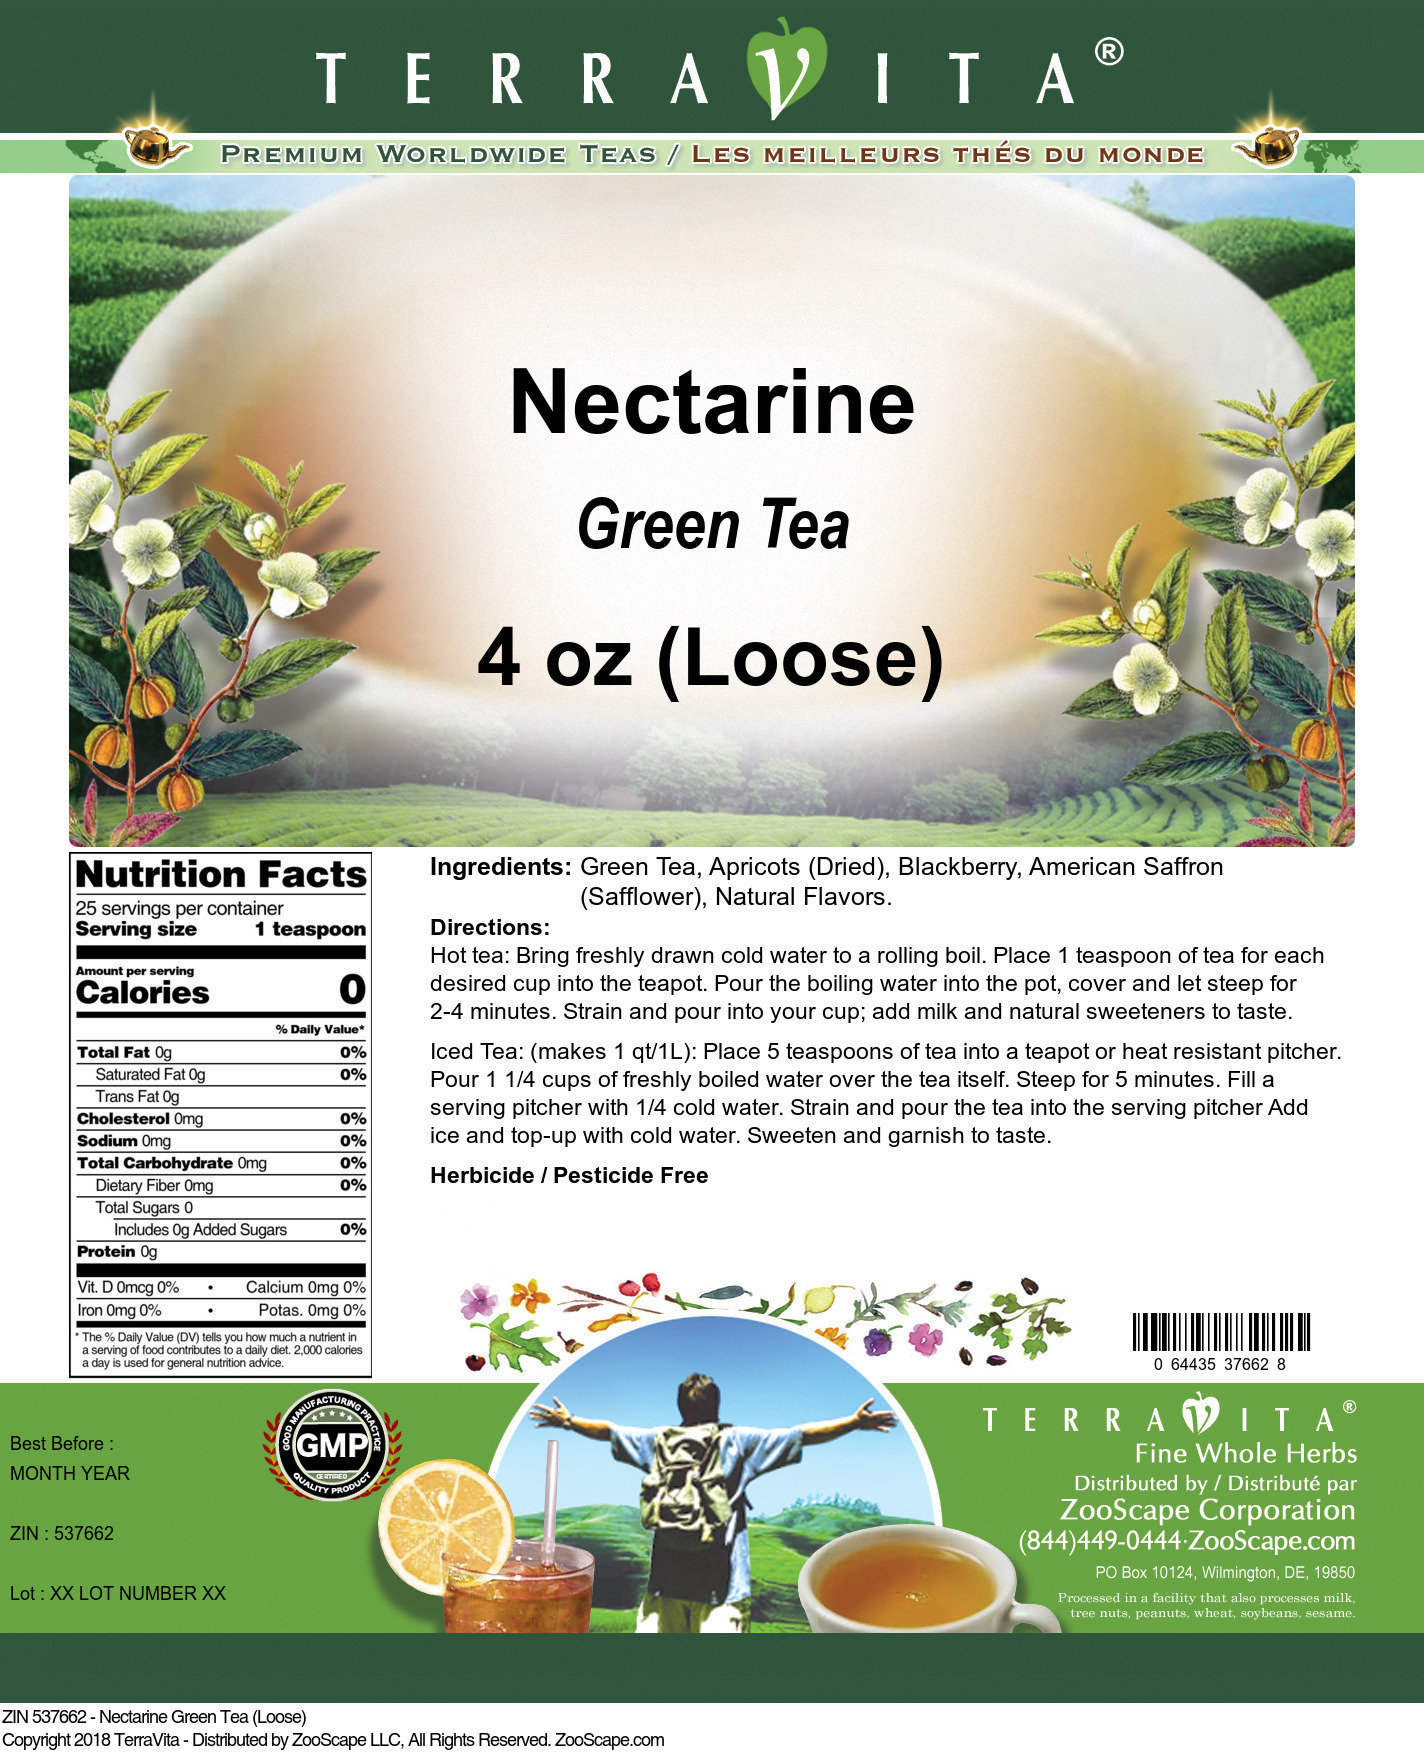 Nectarine Green Tea (Loose)